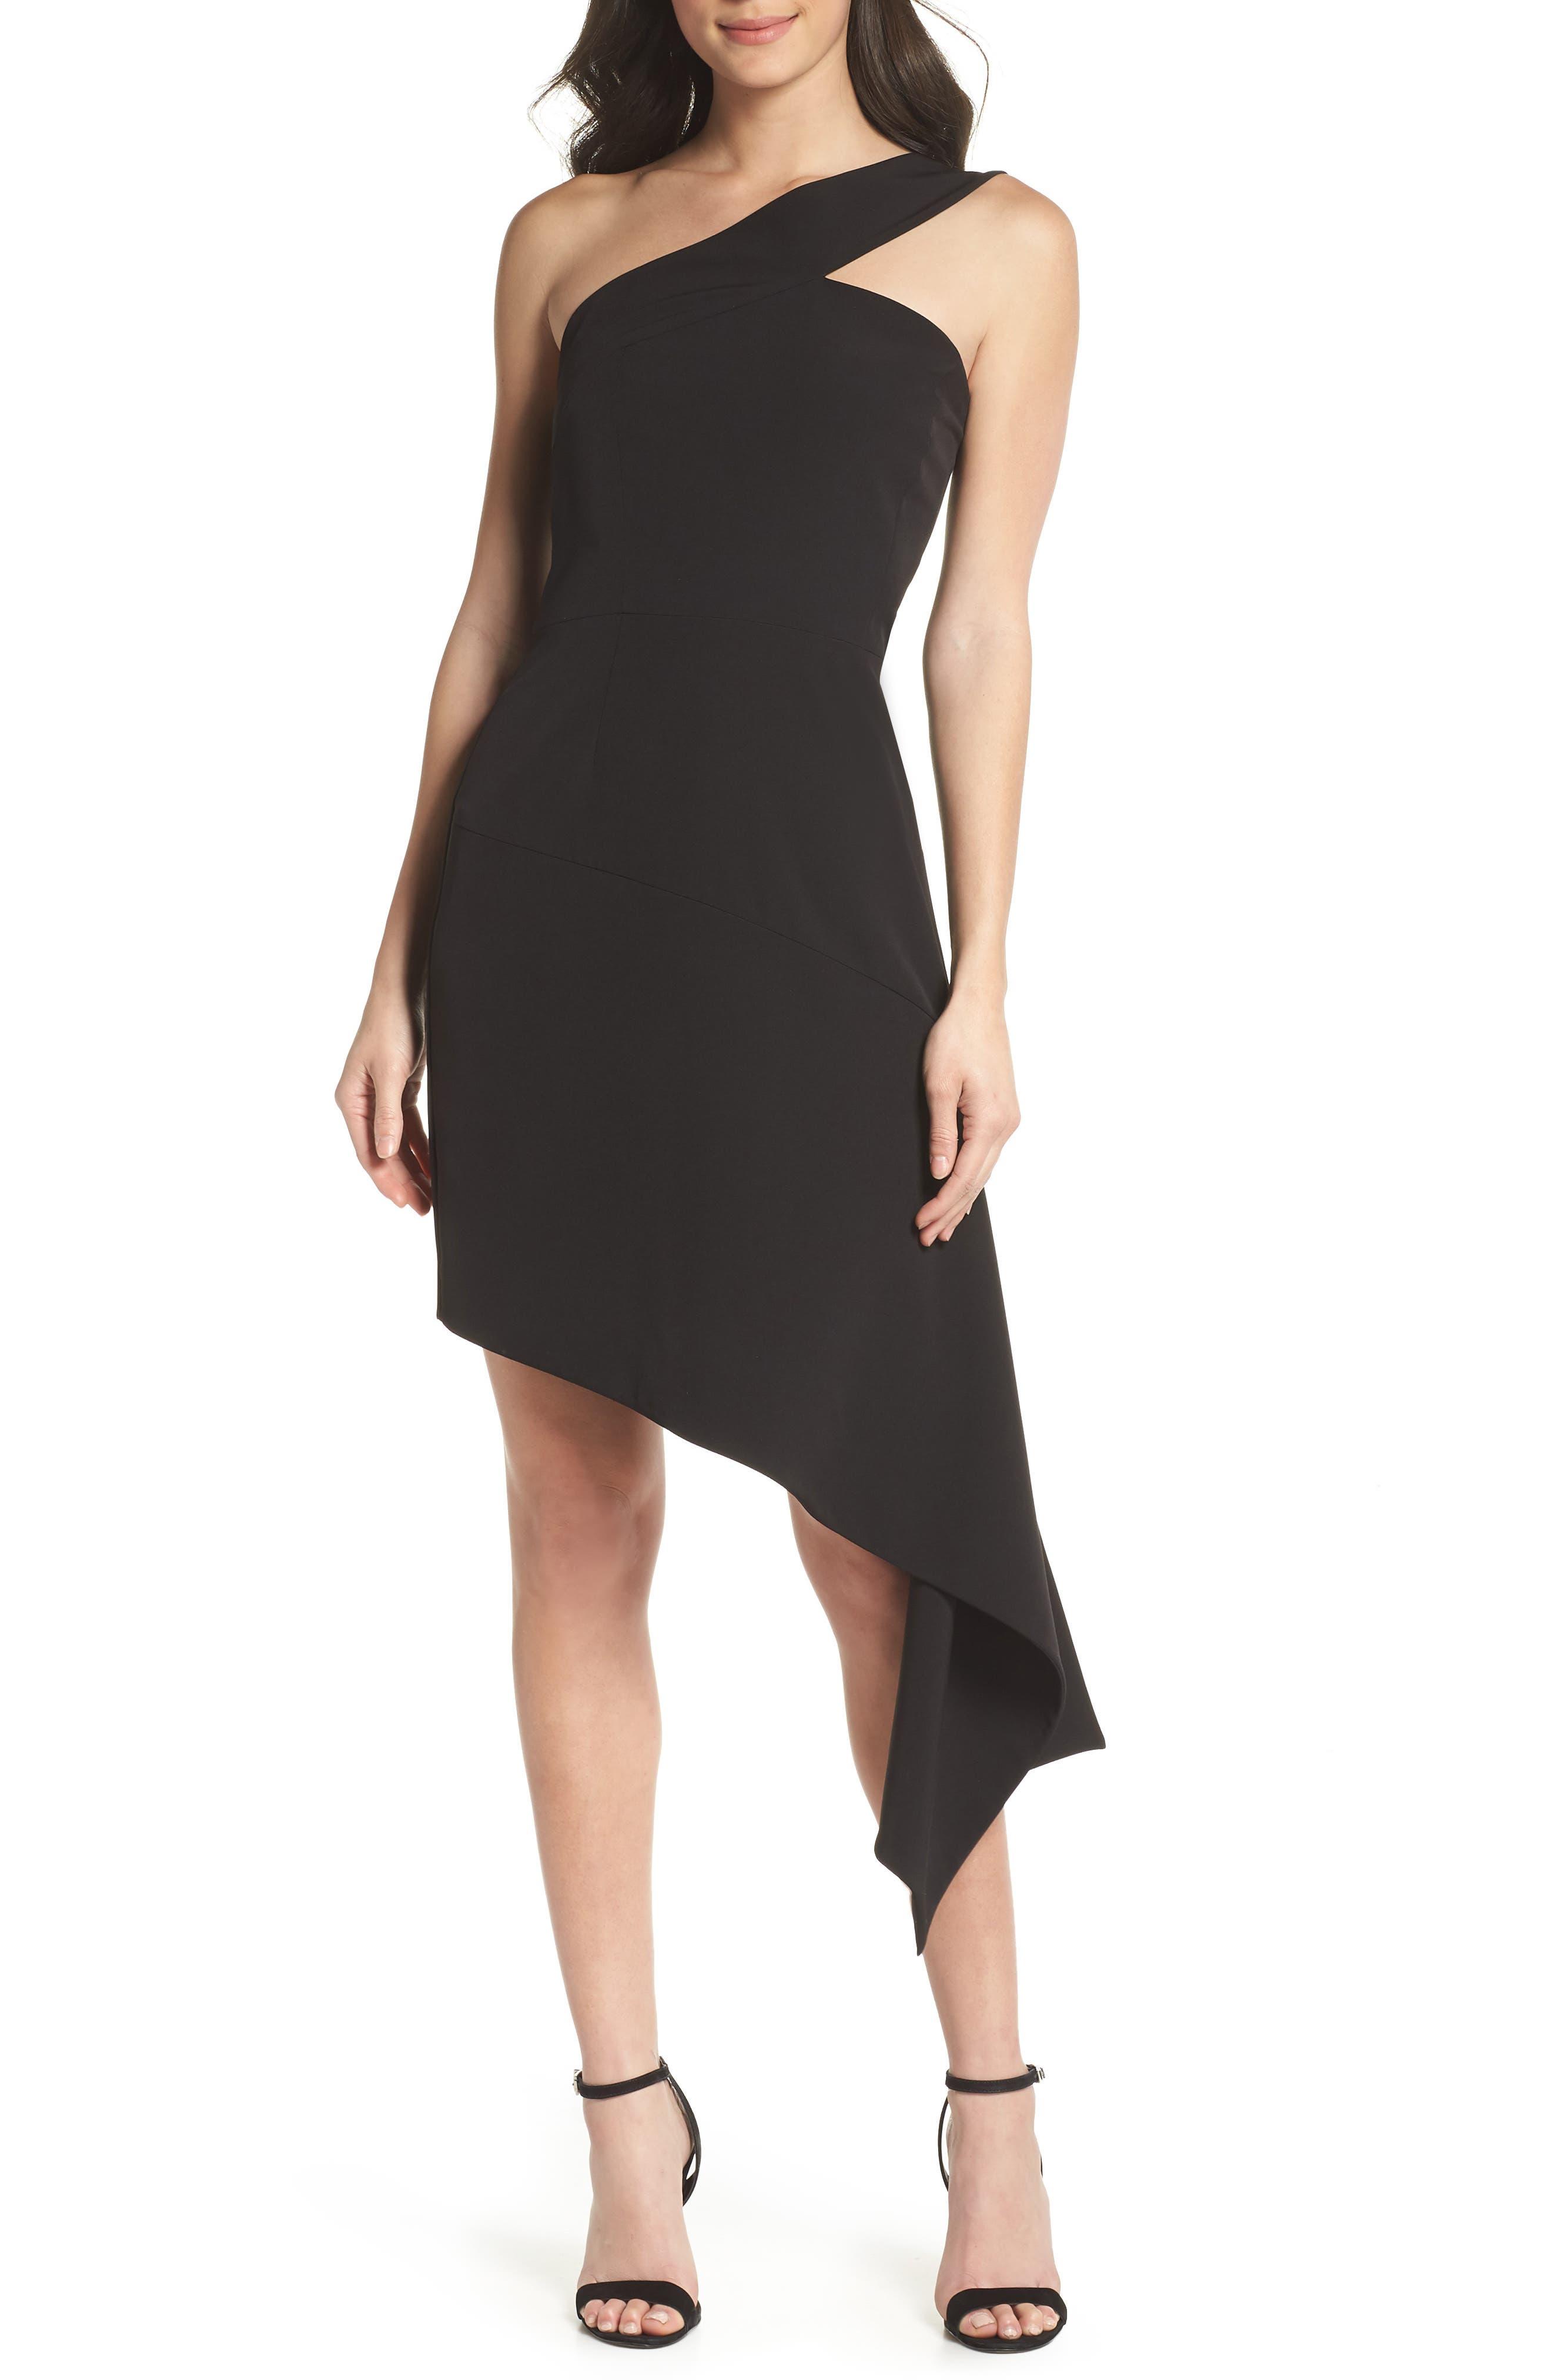 CLOVER AND SLOANE One-Shoulder Asymmetric Dress, Main, color, 001